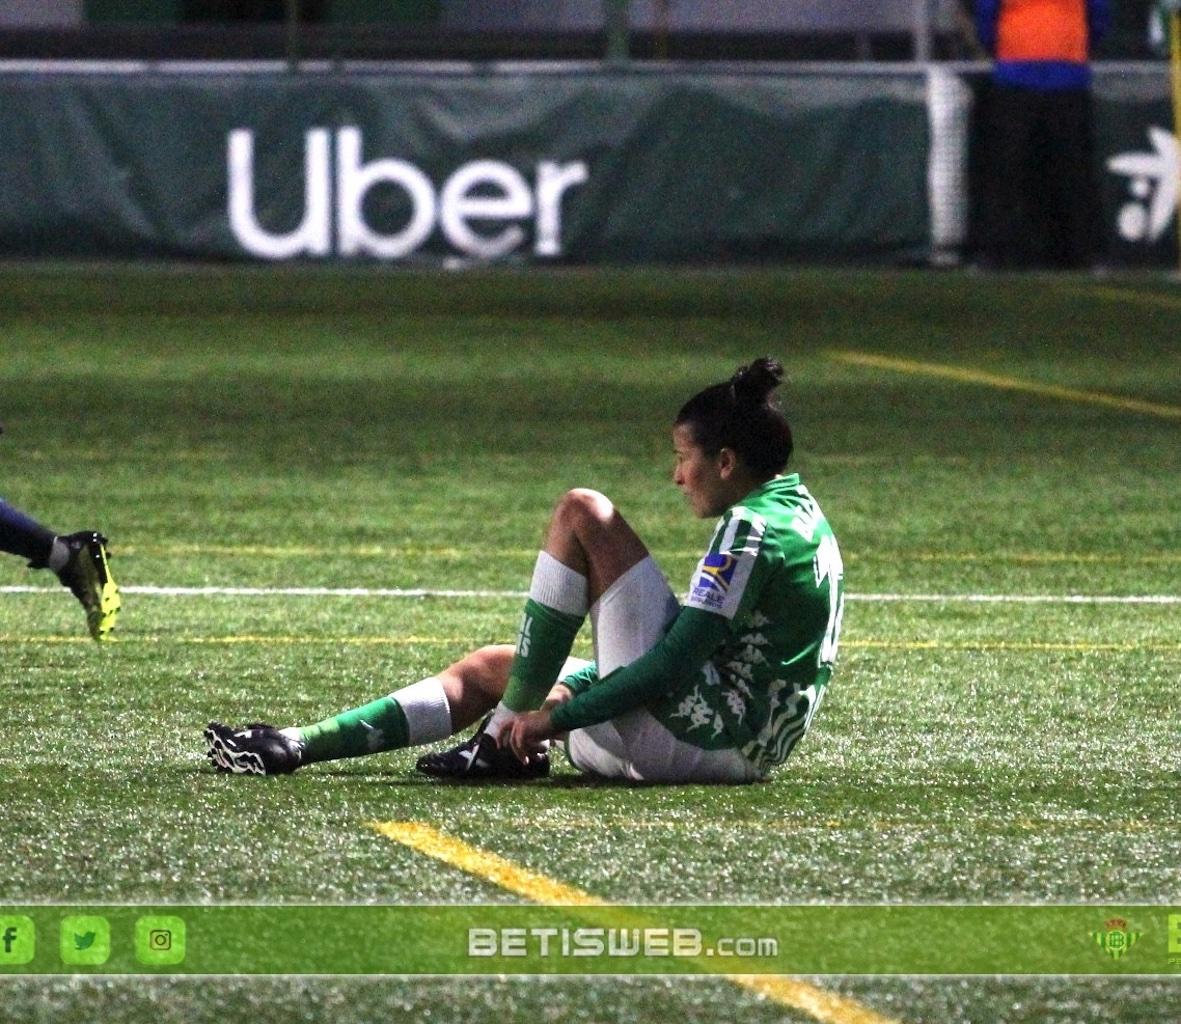 J18 Betis Fem - Real Sociedad 93